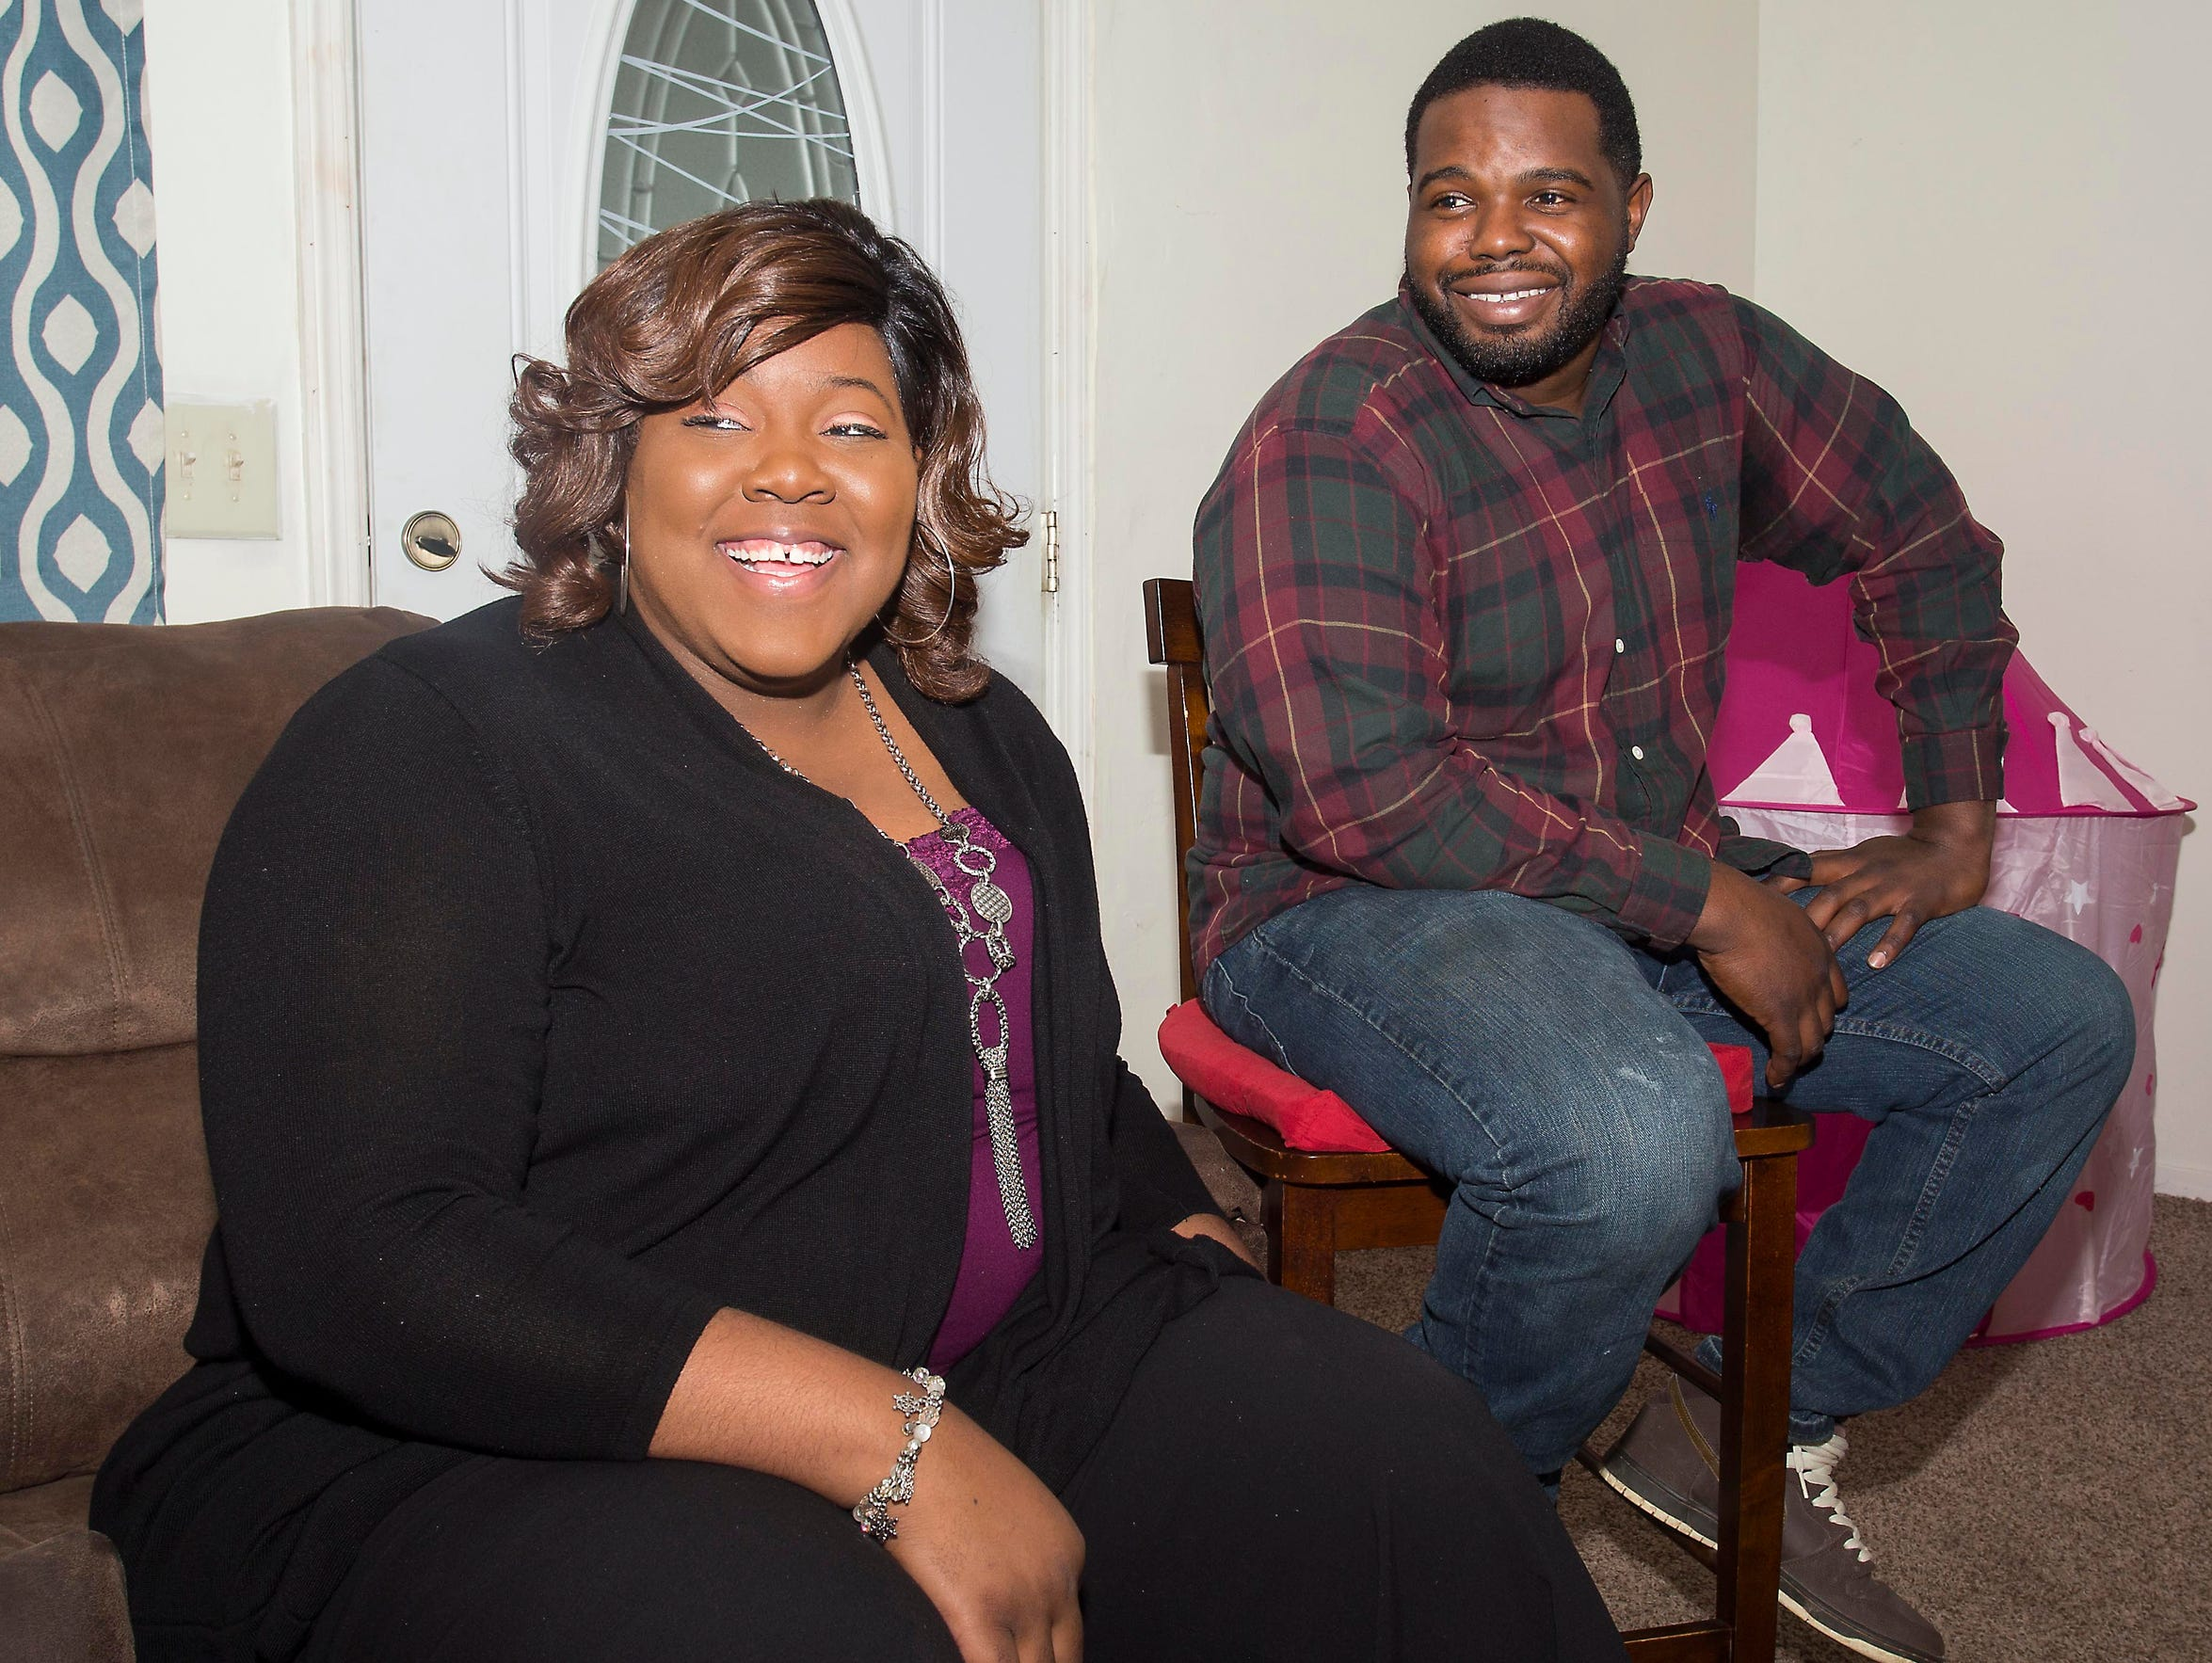 Tishana and Quantrel Alford